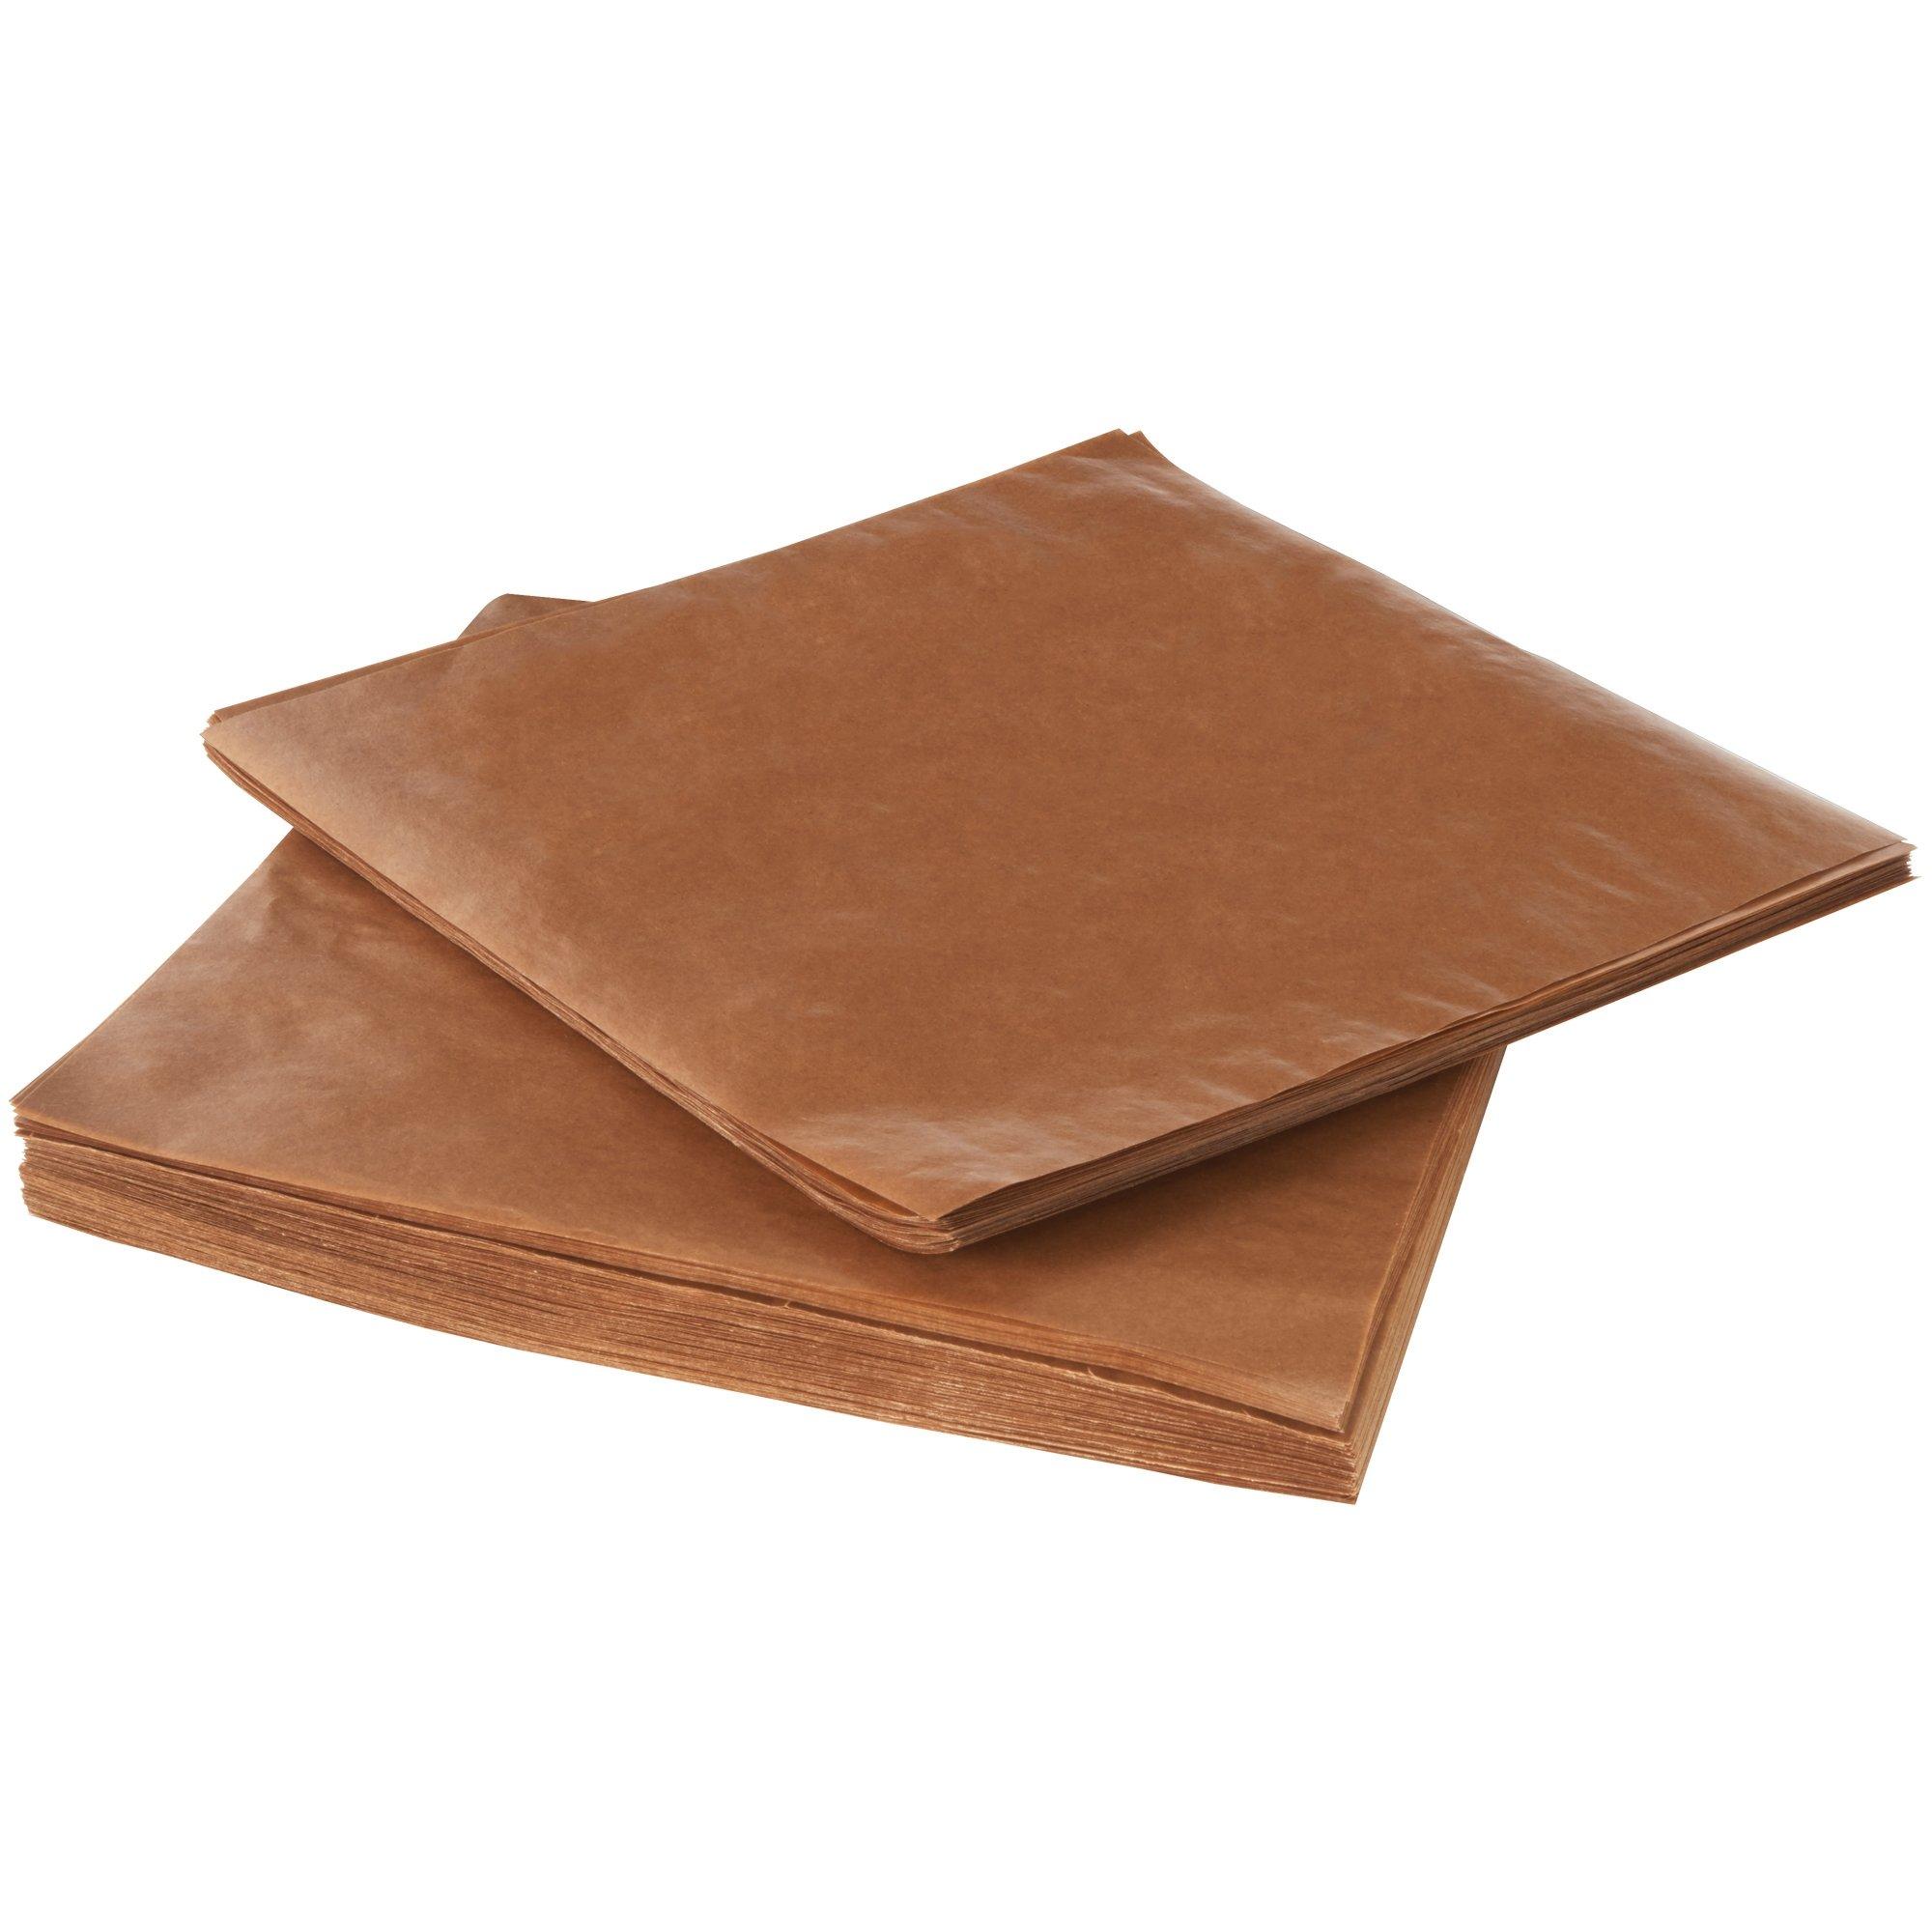 Waxed Paper Sheet, 12'' x 12'', Kraft, 3,400 Sheets by Choice Shipping Supplies